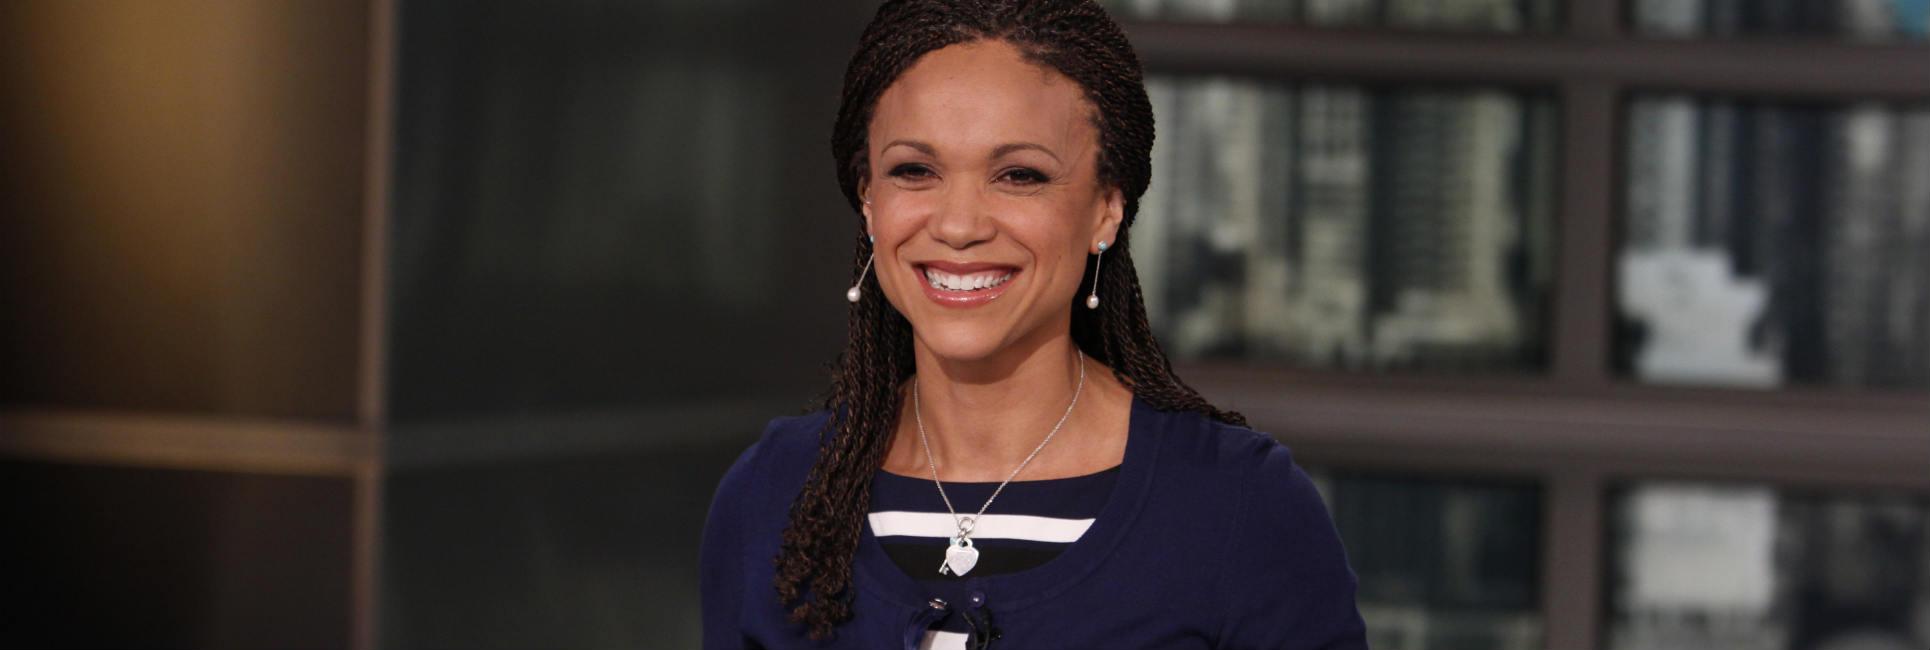 Melissa-Harris-Perry_journalist_hair_banner